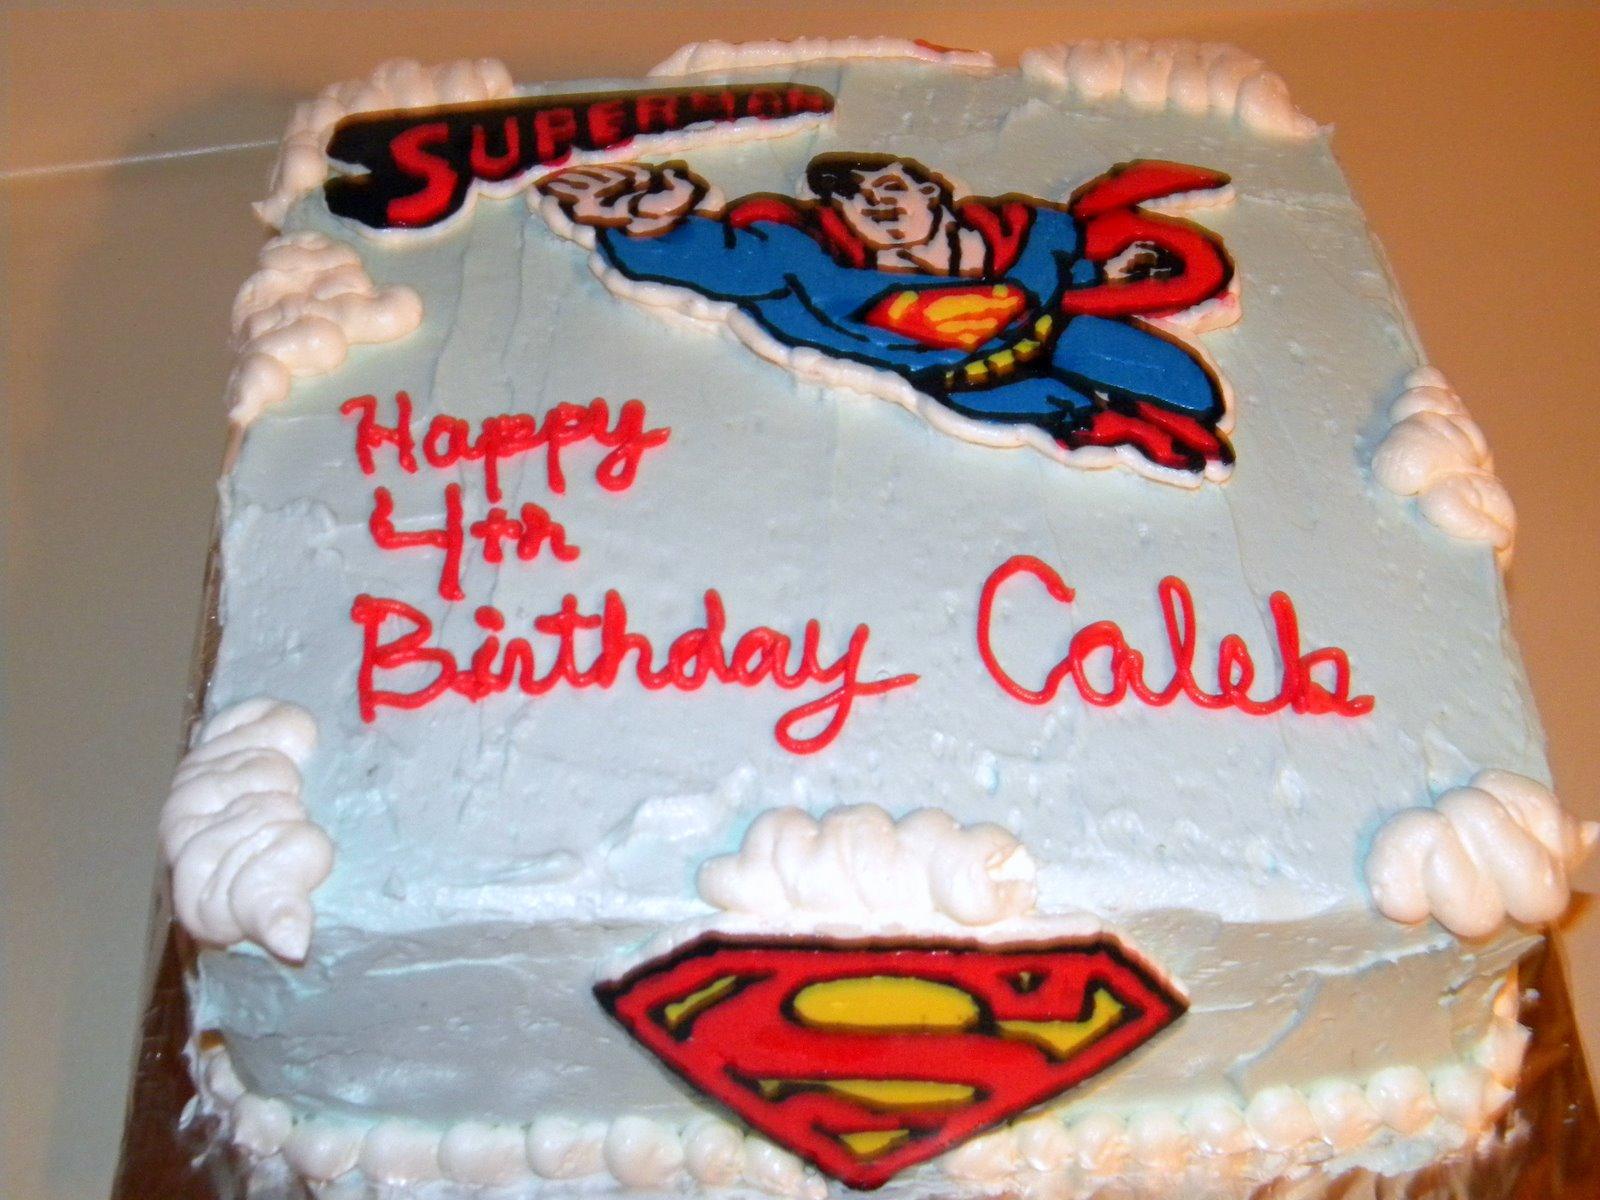 Hear Me Rohrer Caleb S Birthday Cake